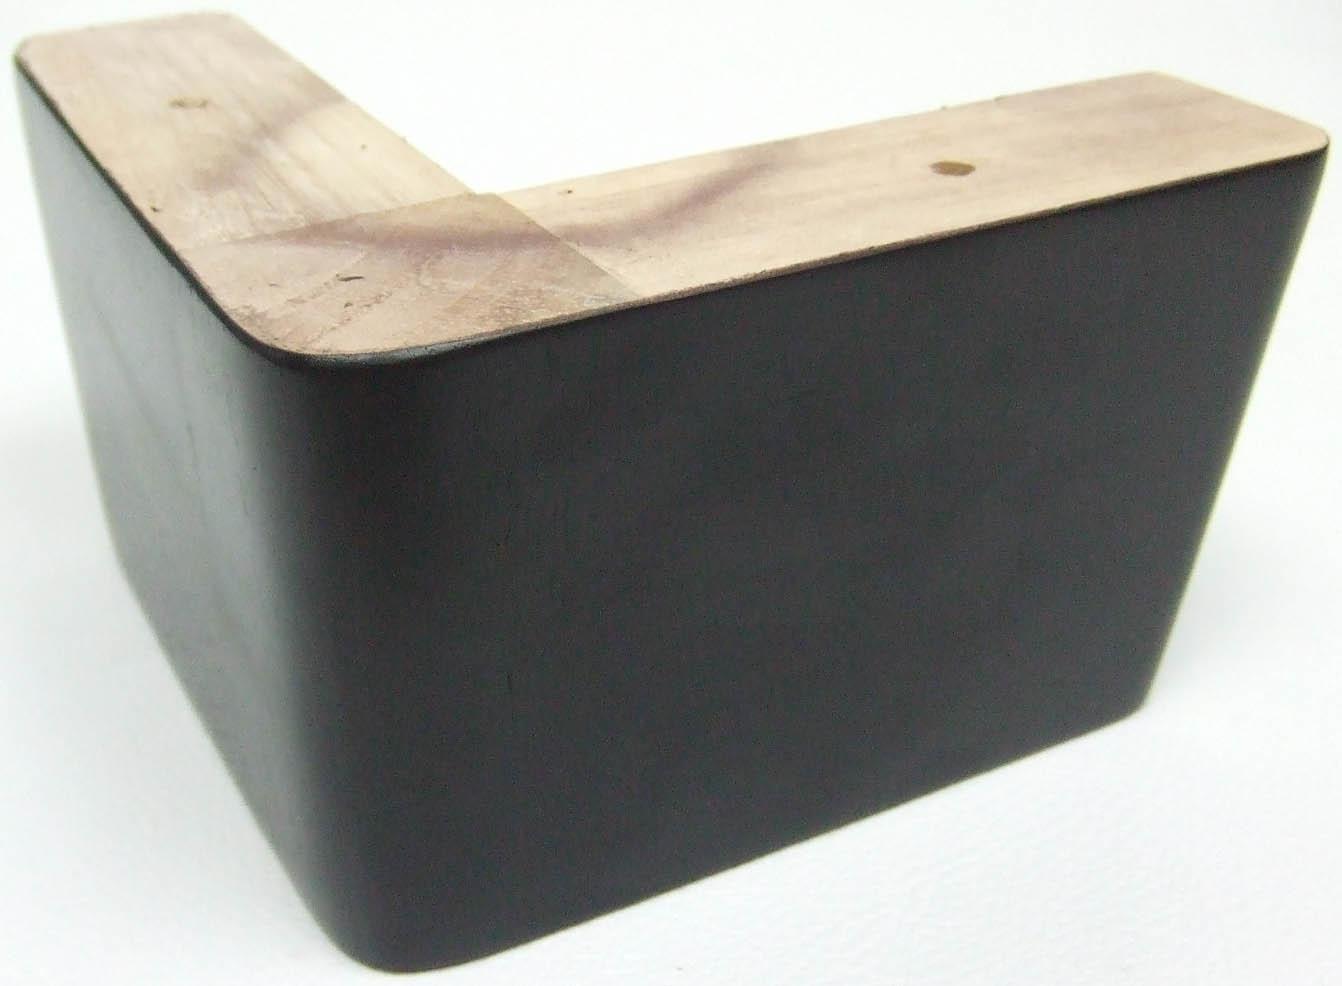 Beau Wooden Sofa Leg (Деревянный диван Нога) · Zoom In